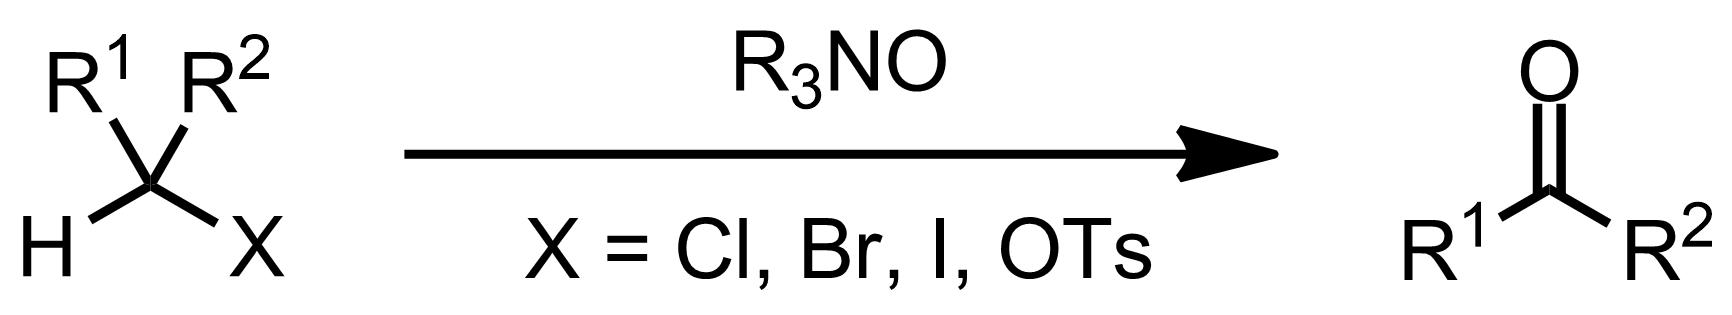 Schematic representation of the Ganem Oxidation.